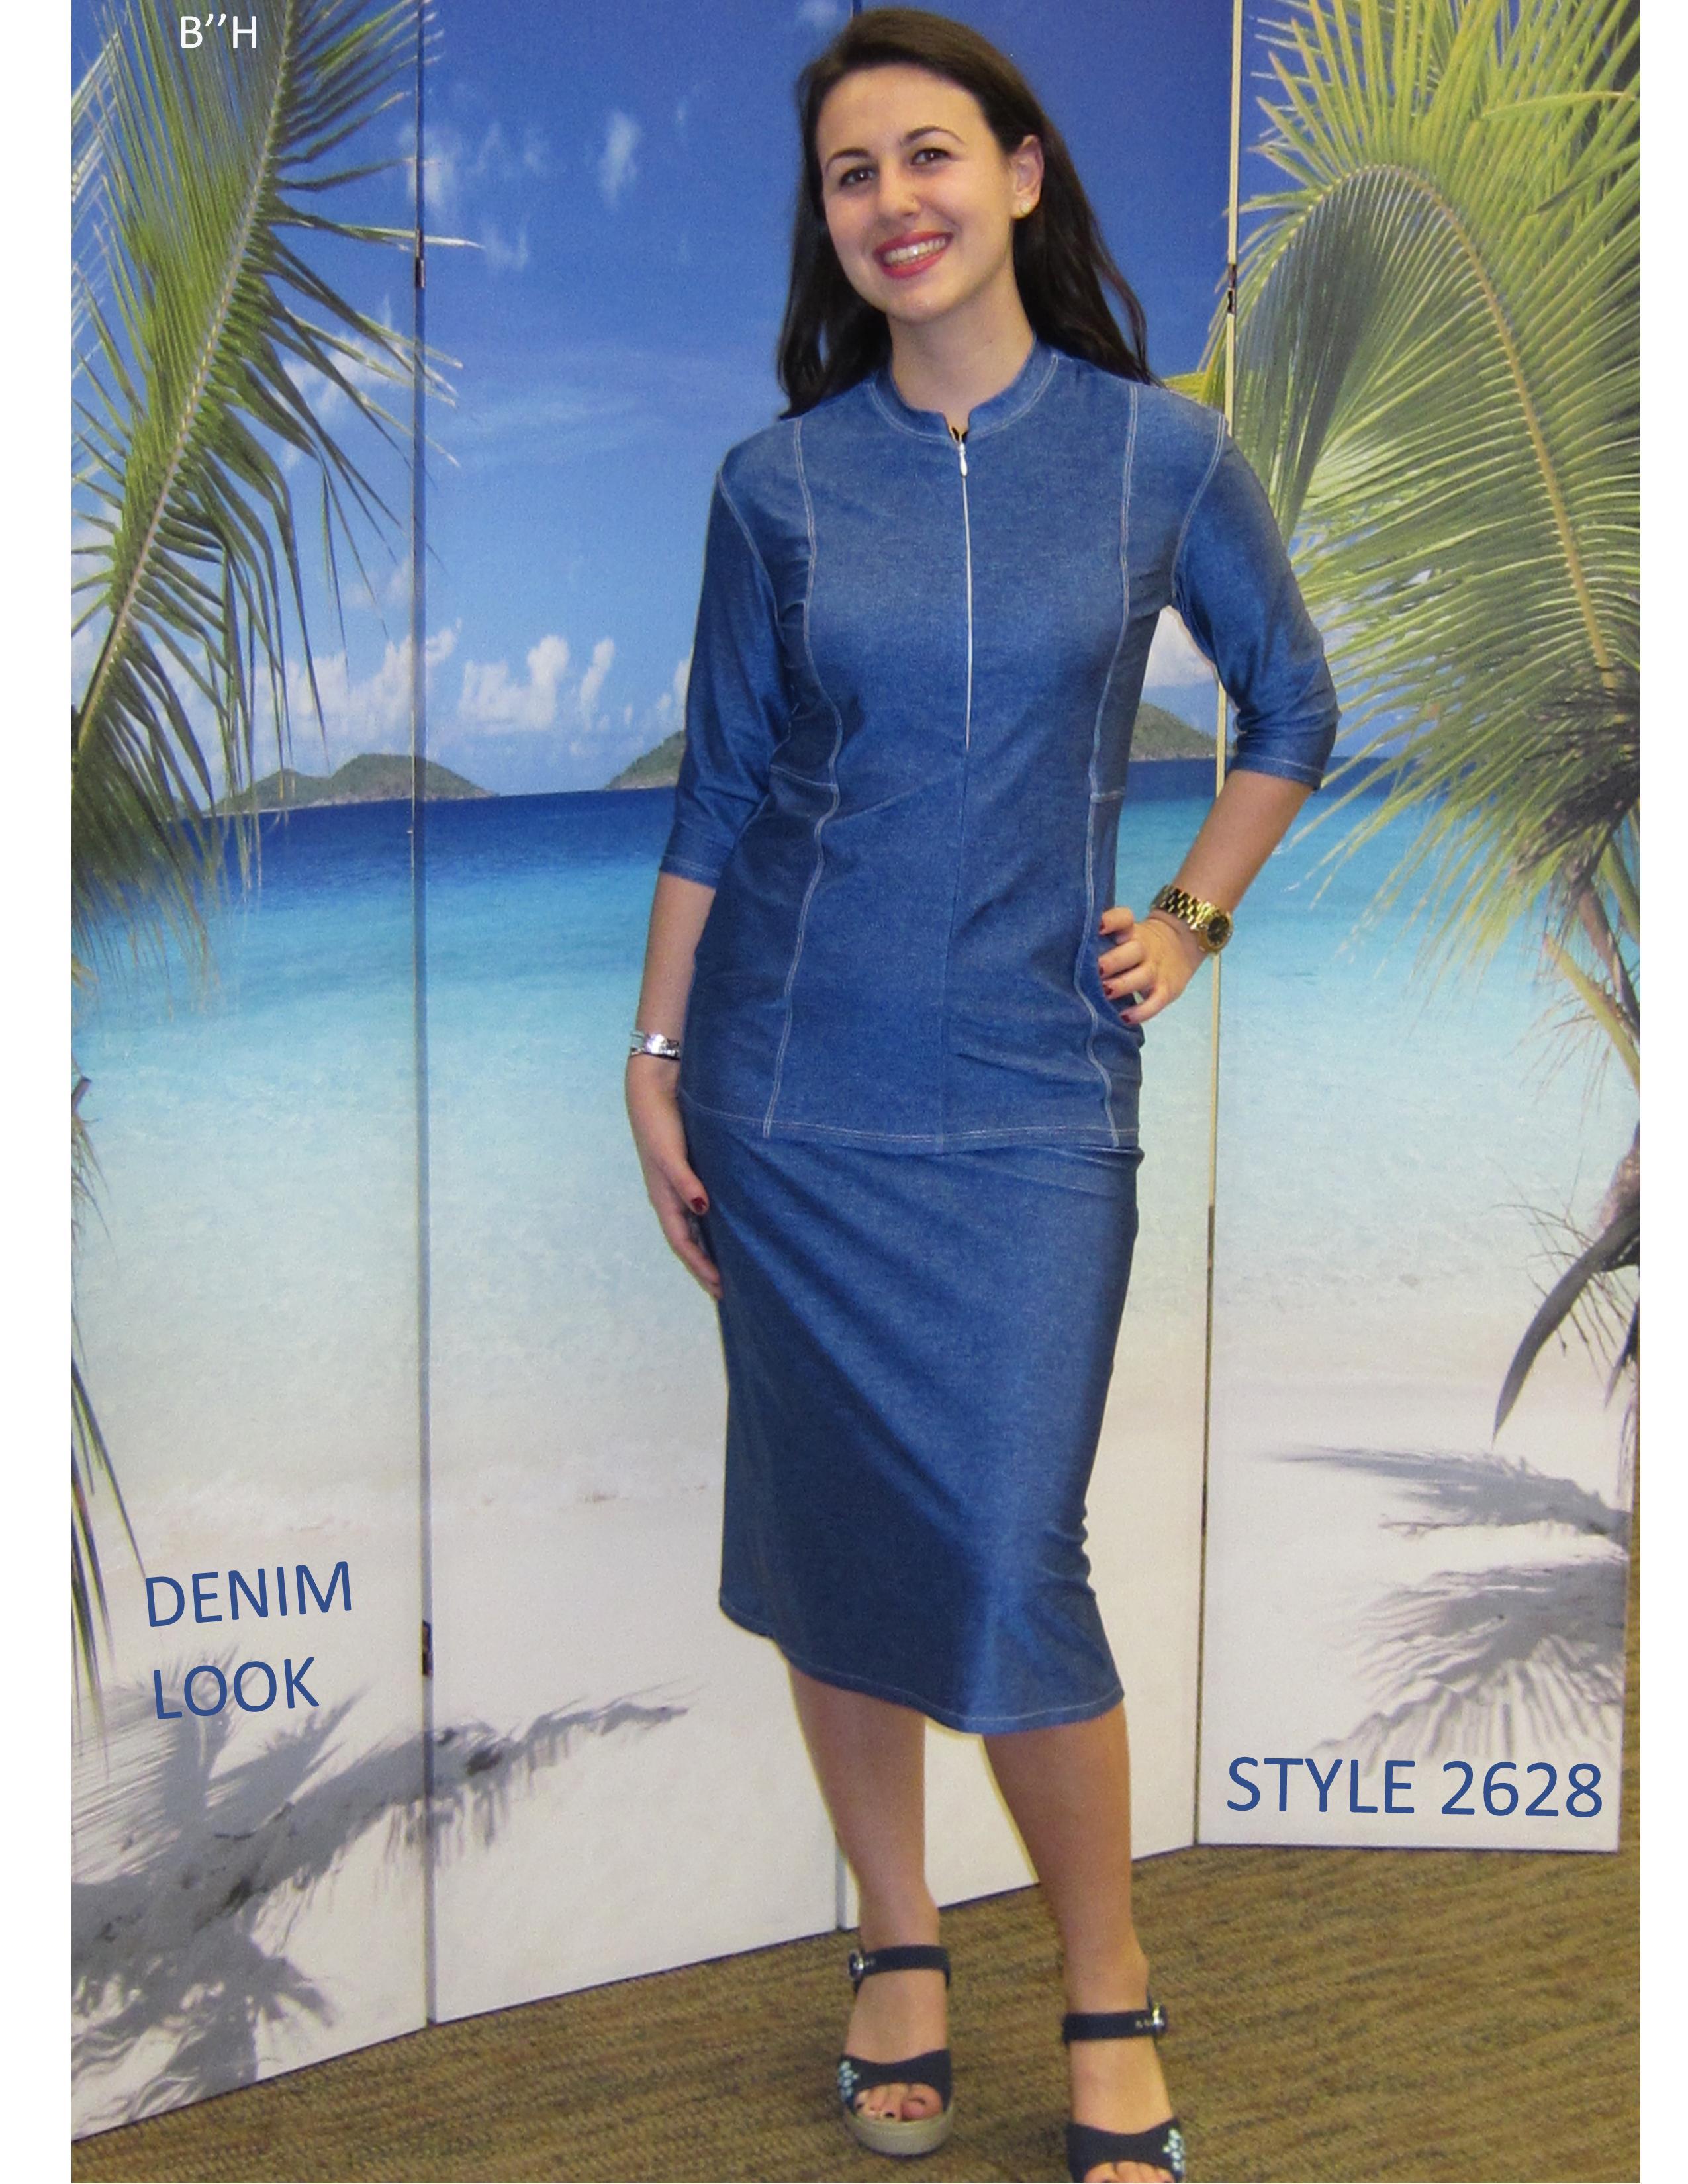 style-2628-denim-look-four-piece-set-on-model-1-.jpg